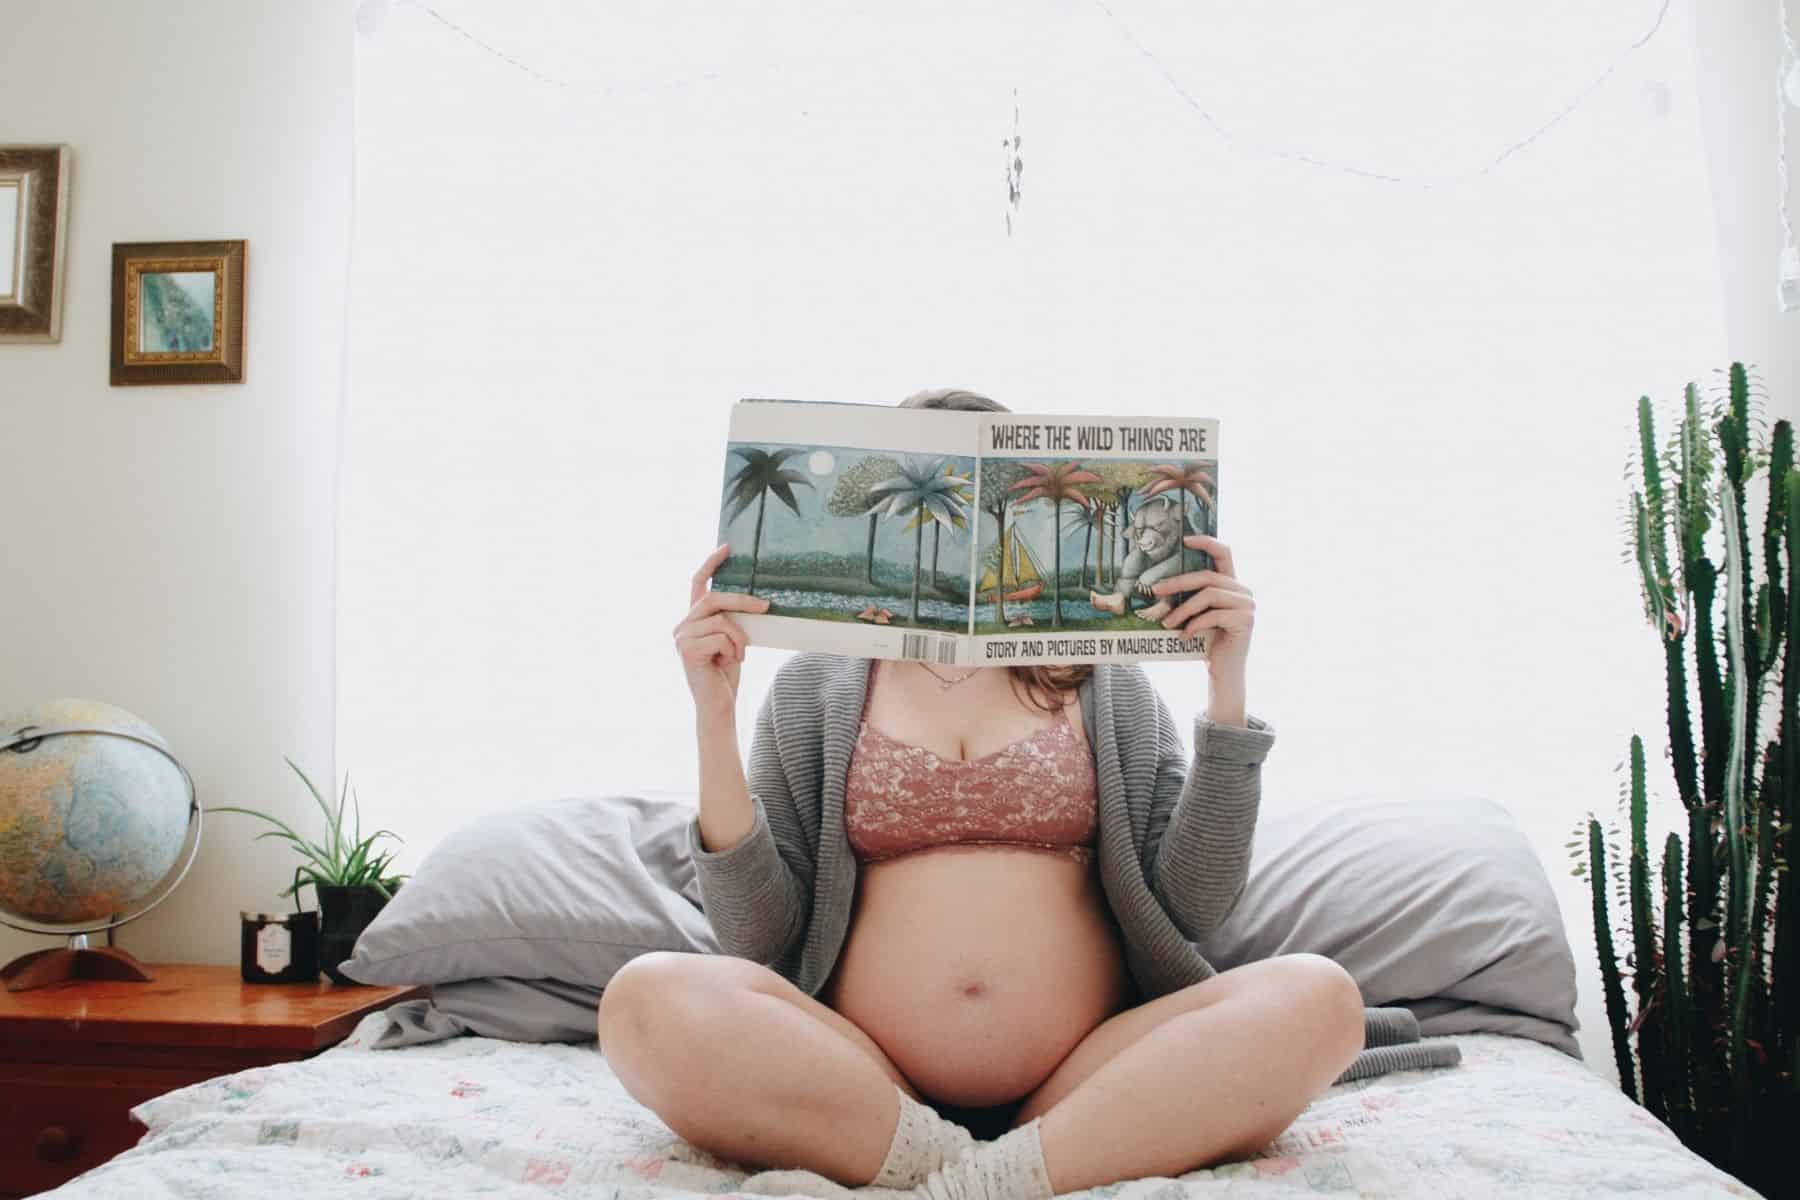 maternity photos - studying